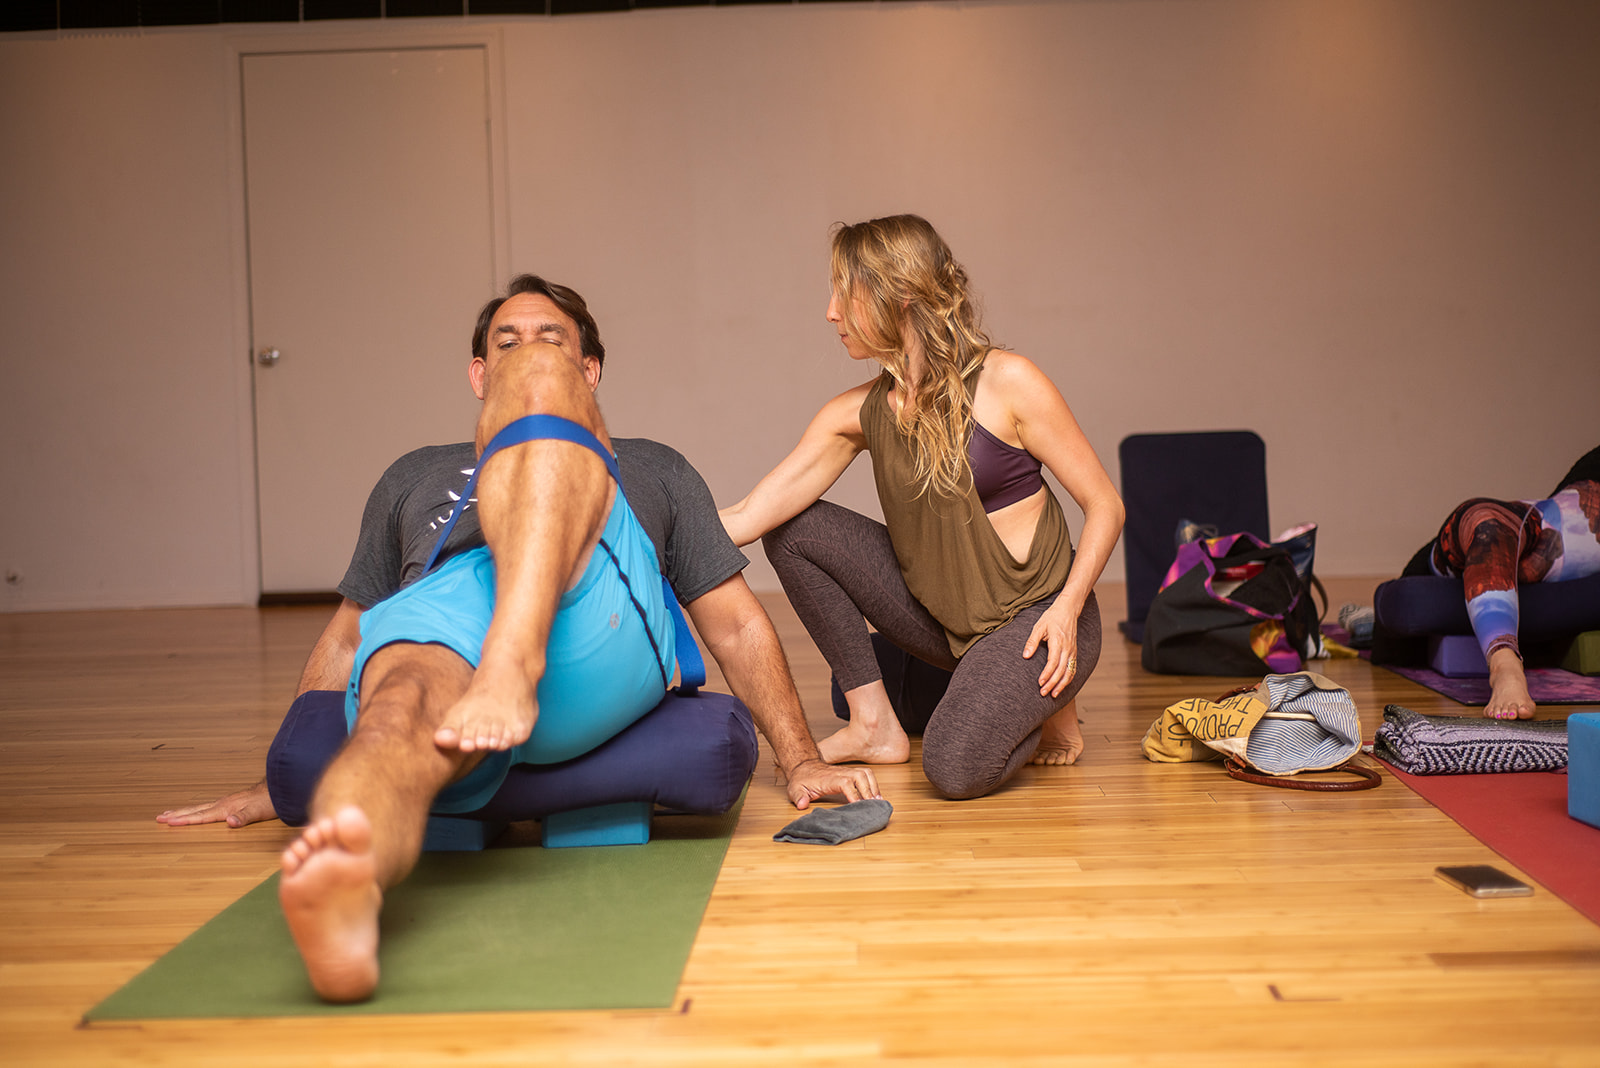 Copy of yin-yoga-teacher-training-durga-excursions-colorado-july-202040.jpg